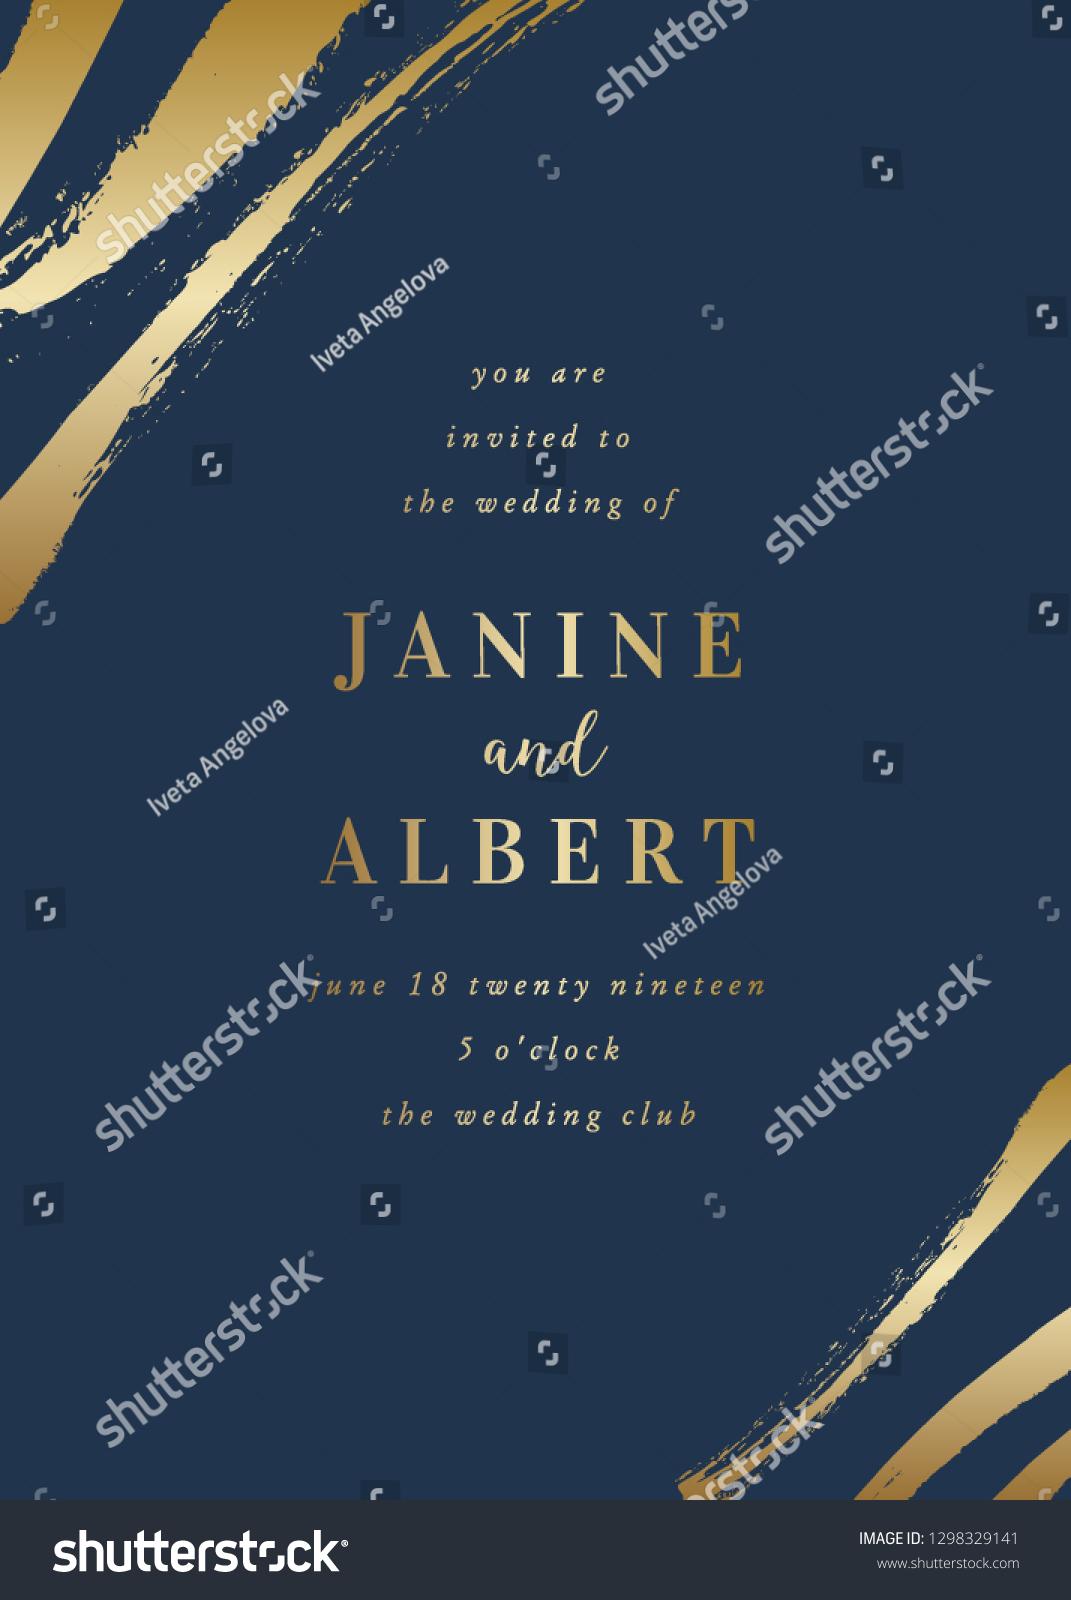 Sample Wedding Invitation Design